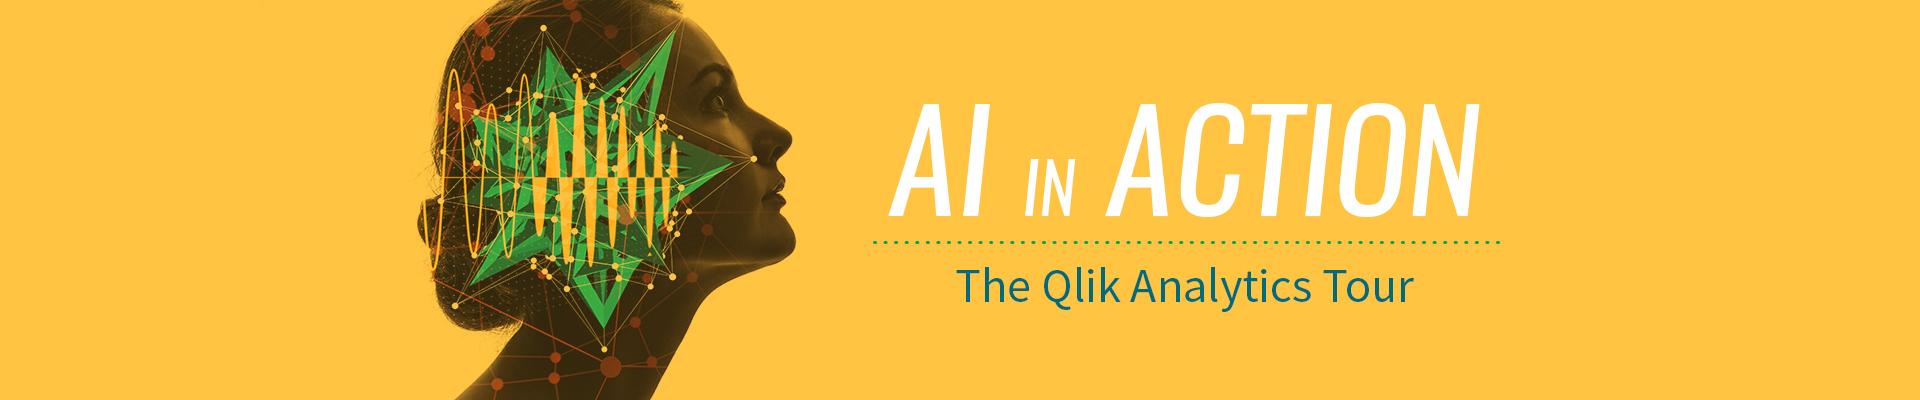 Qlik Analytics Tour 2019